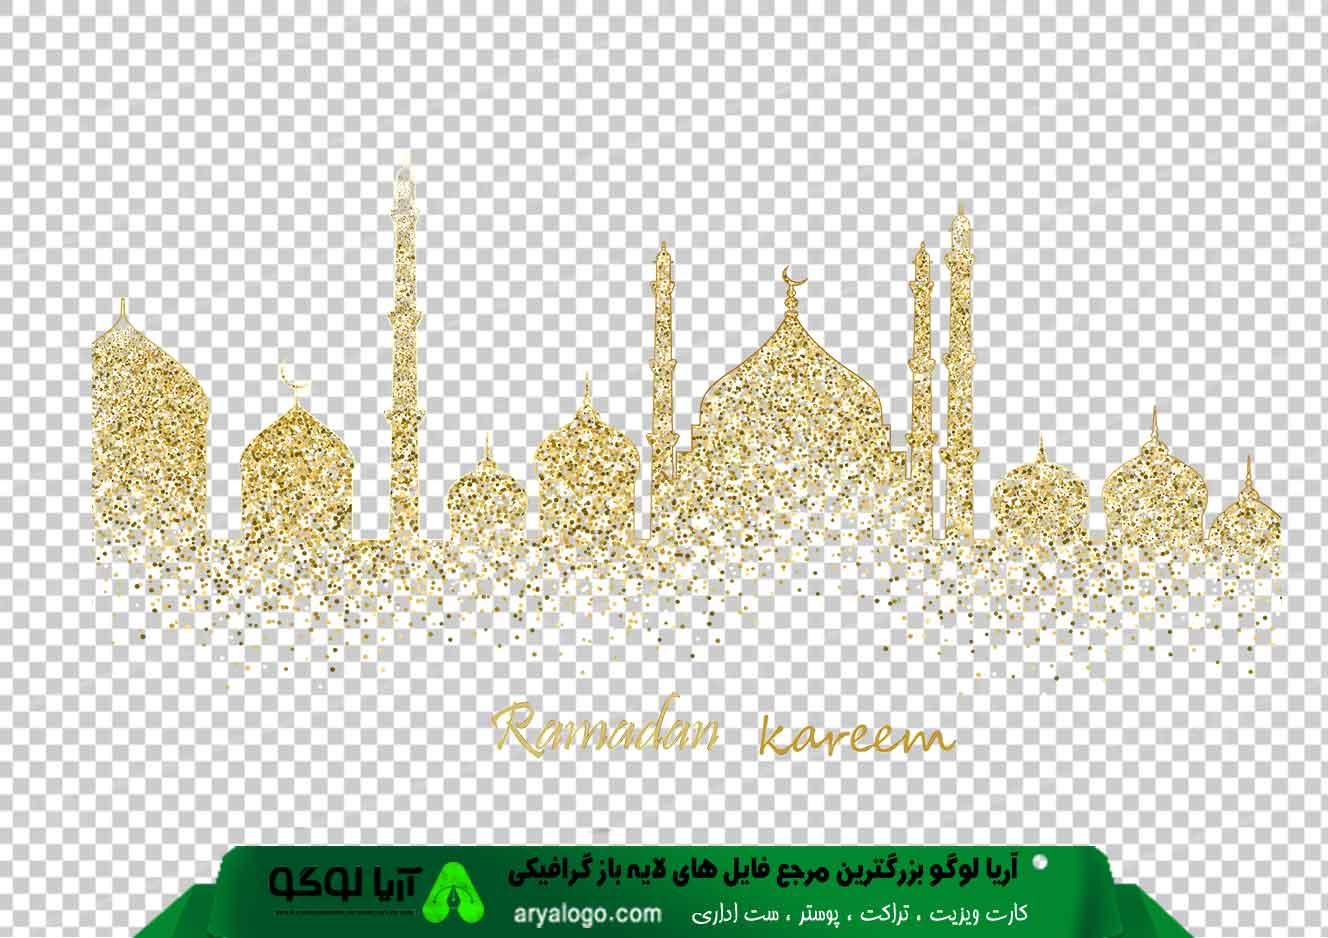 وکتور png ماه رمضان 19